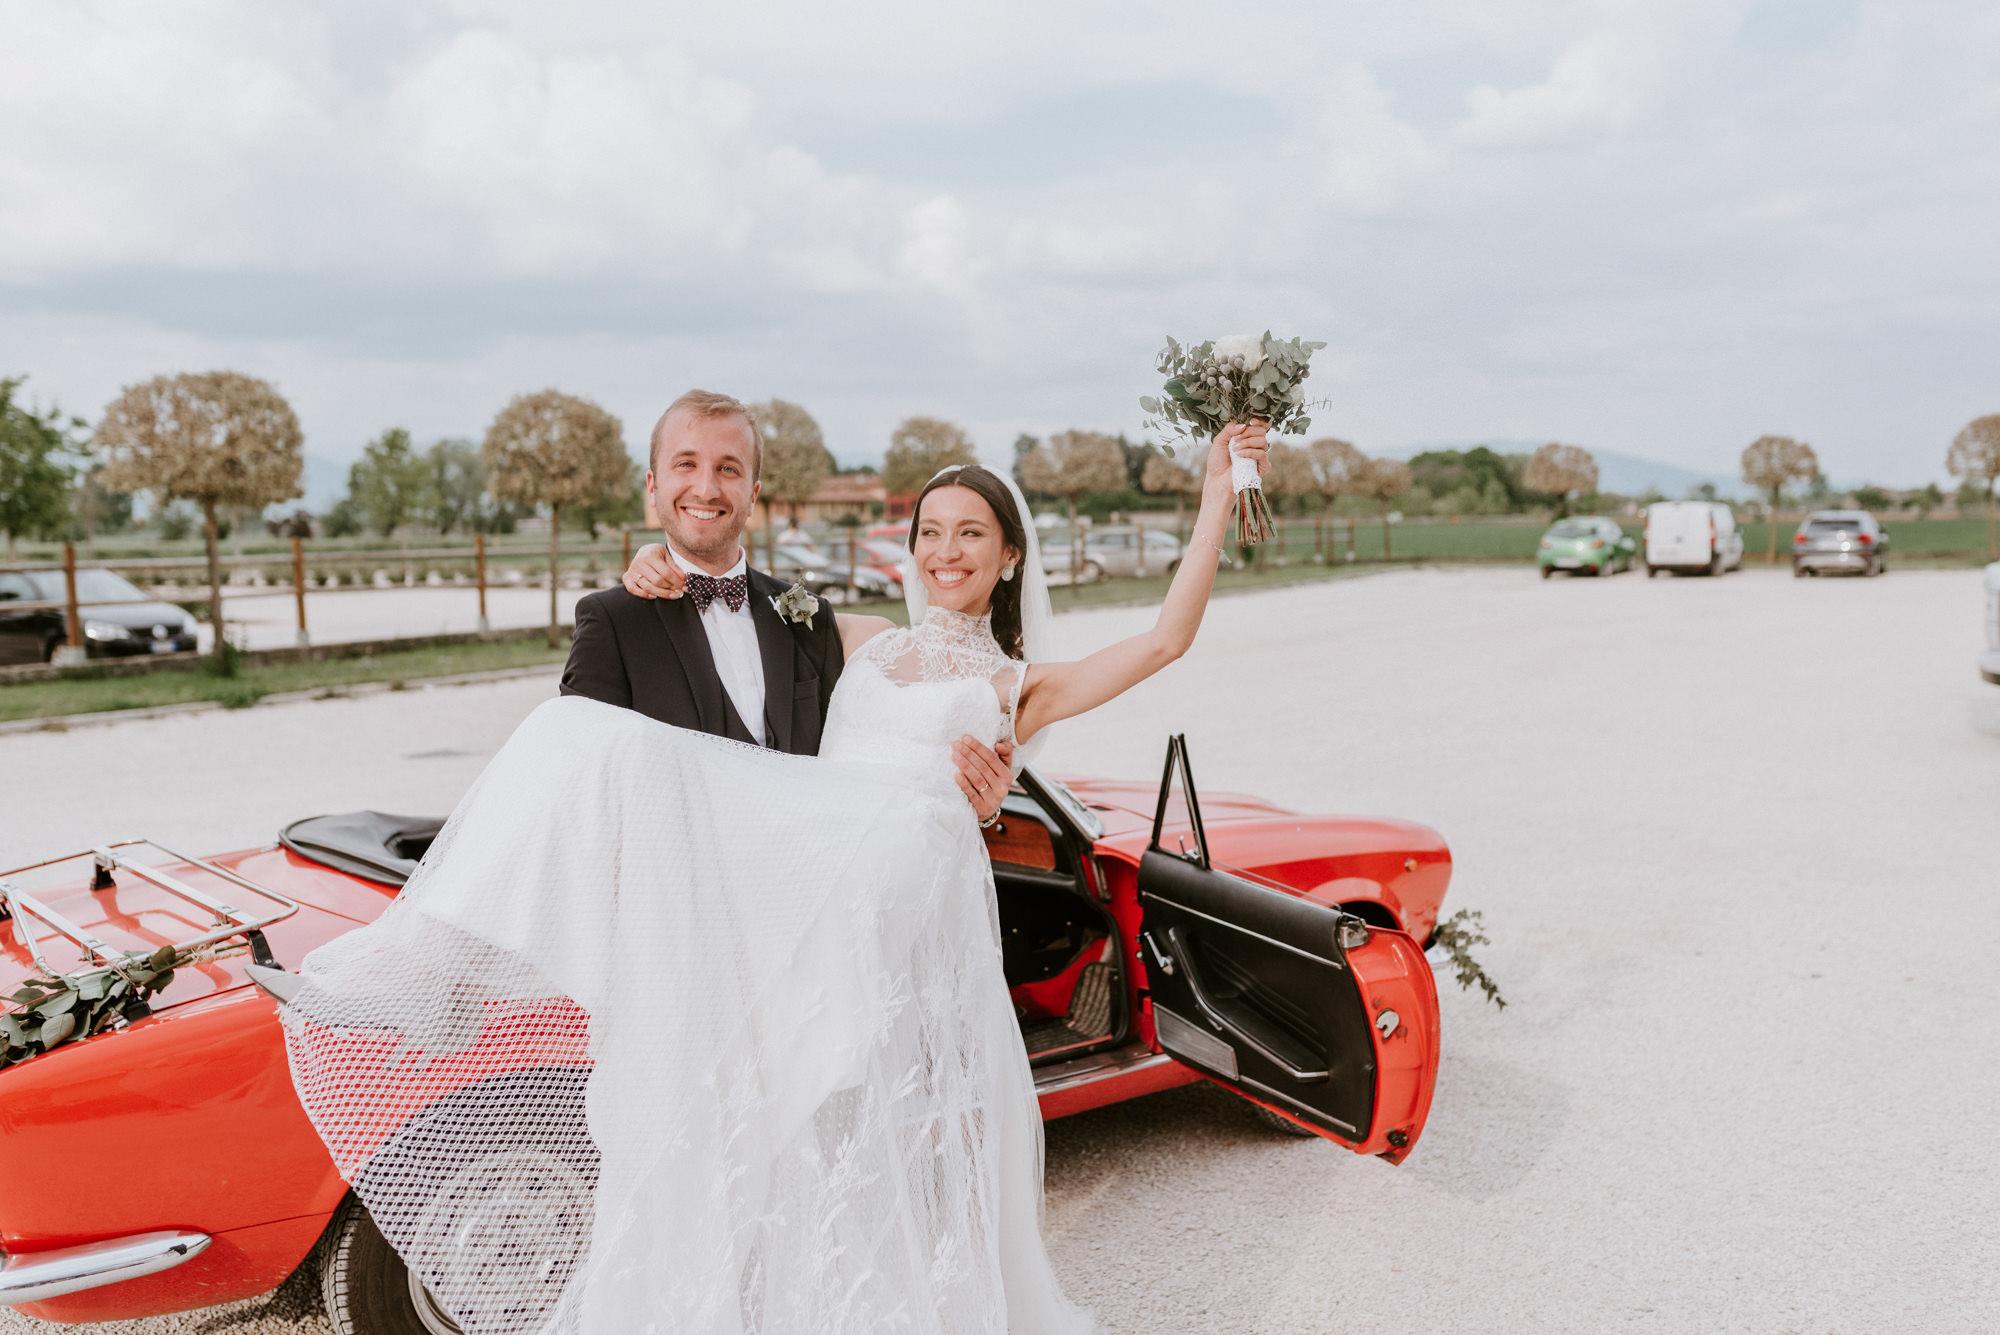 FOTO+PHOTO+BODA+WEDDING+ITALIA+ITALY+MAURICIO+GARAY+MAURICIOGARAY+WEDDINPHOTOGRAPHER+FOTOGRAFODEBODA-1381.jpg